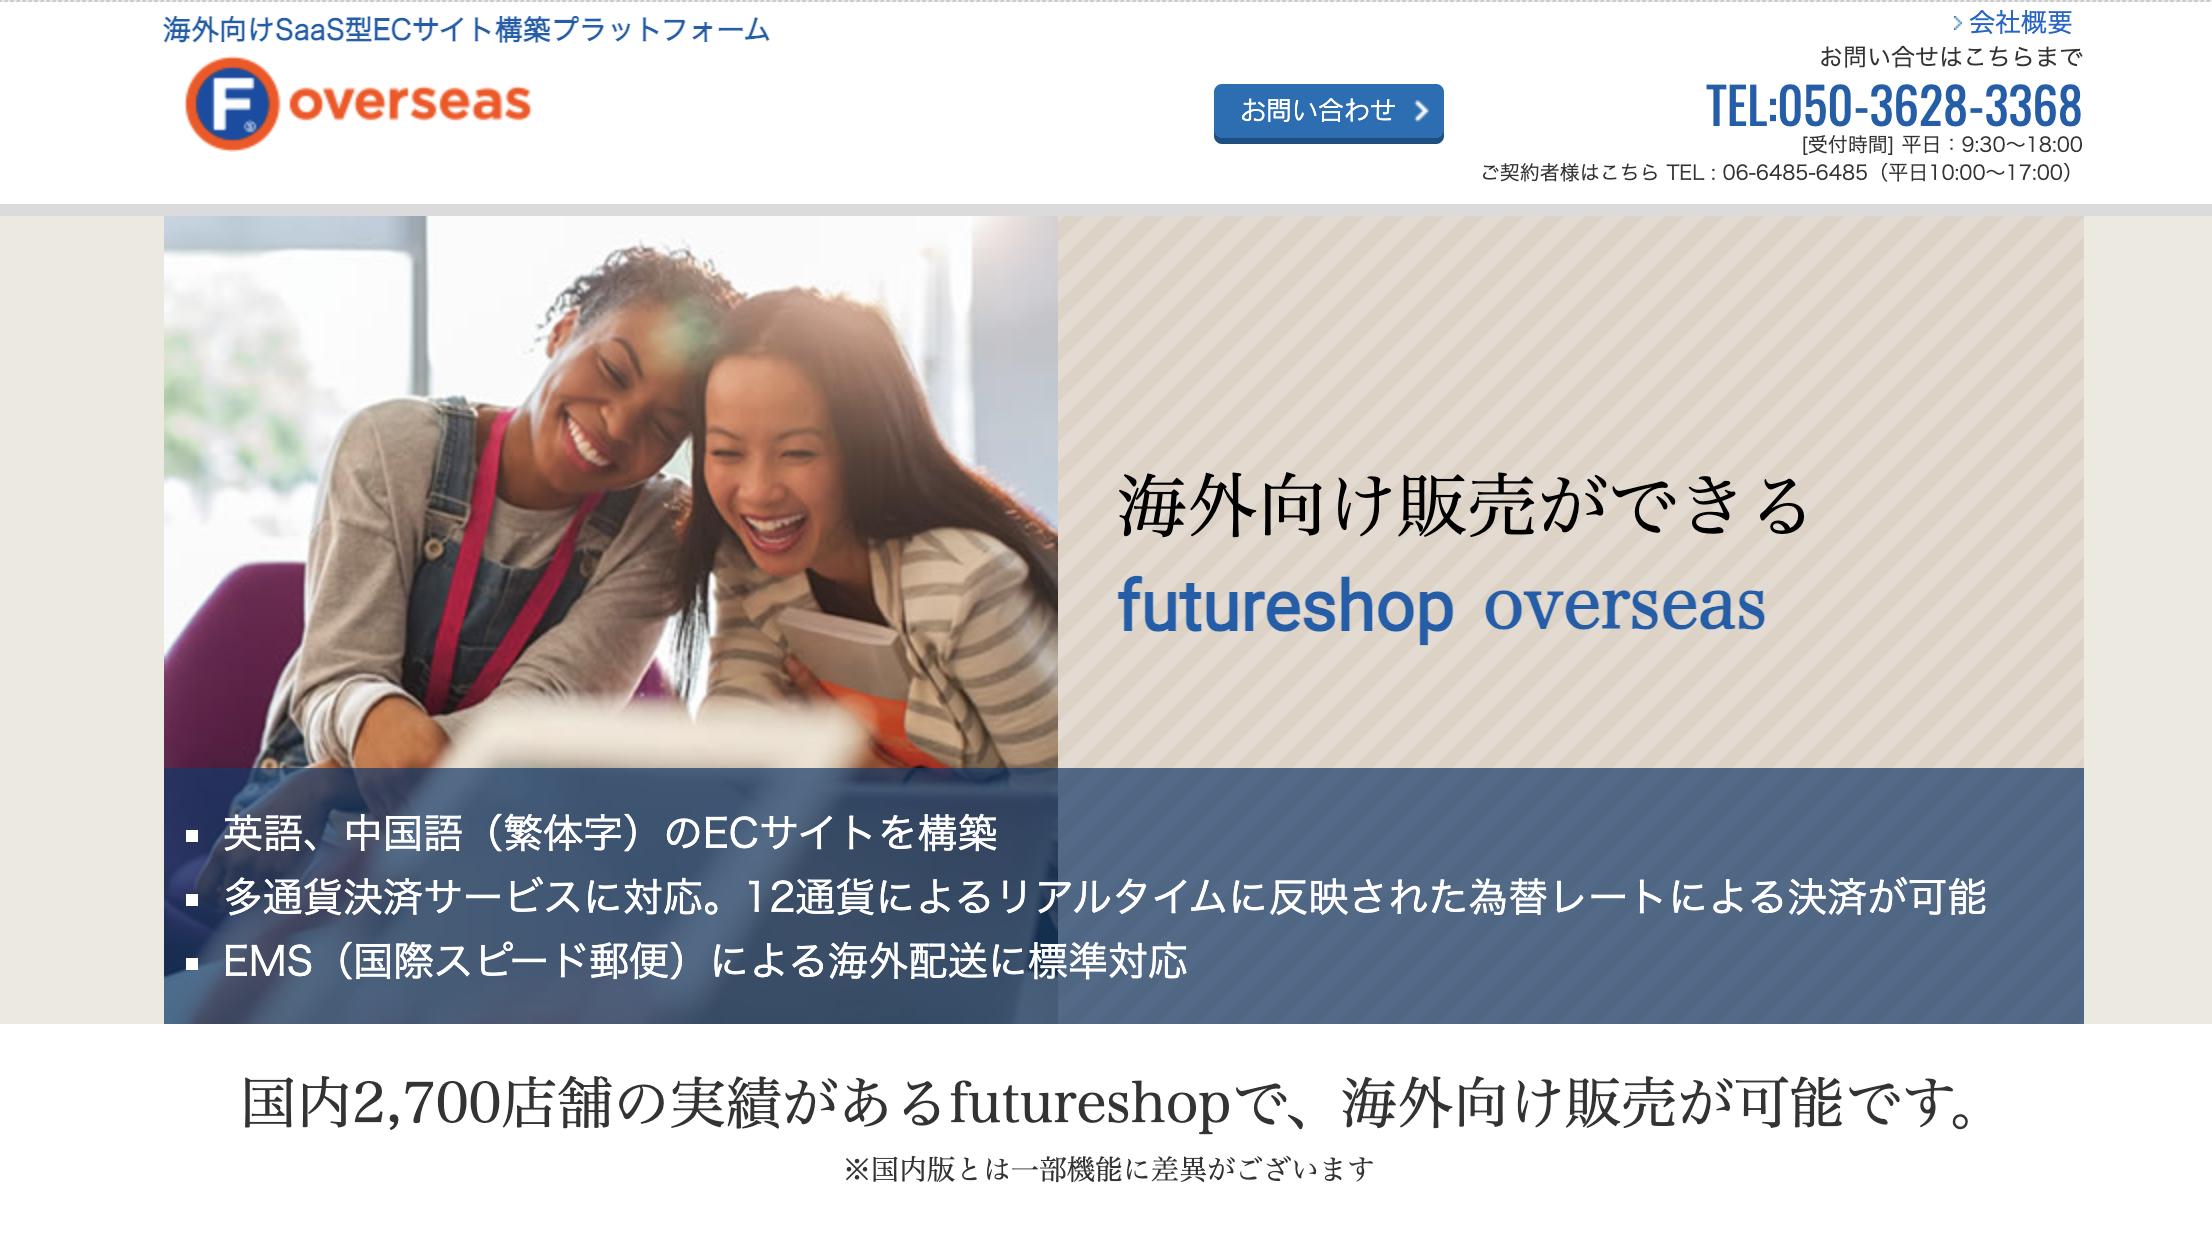 Futureshop overseas